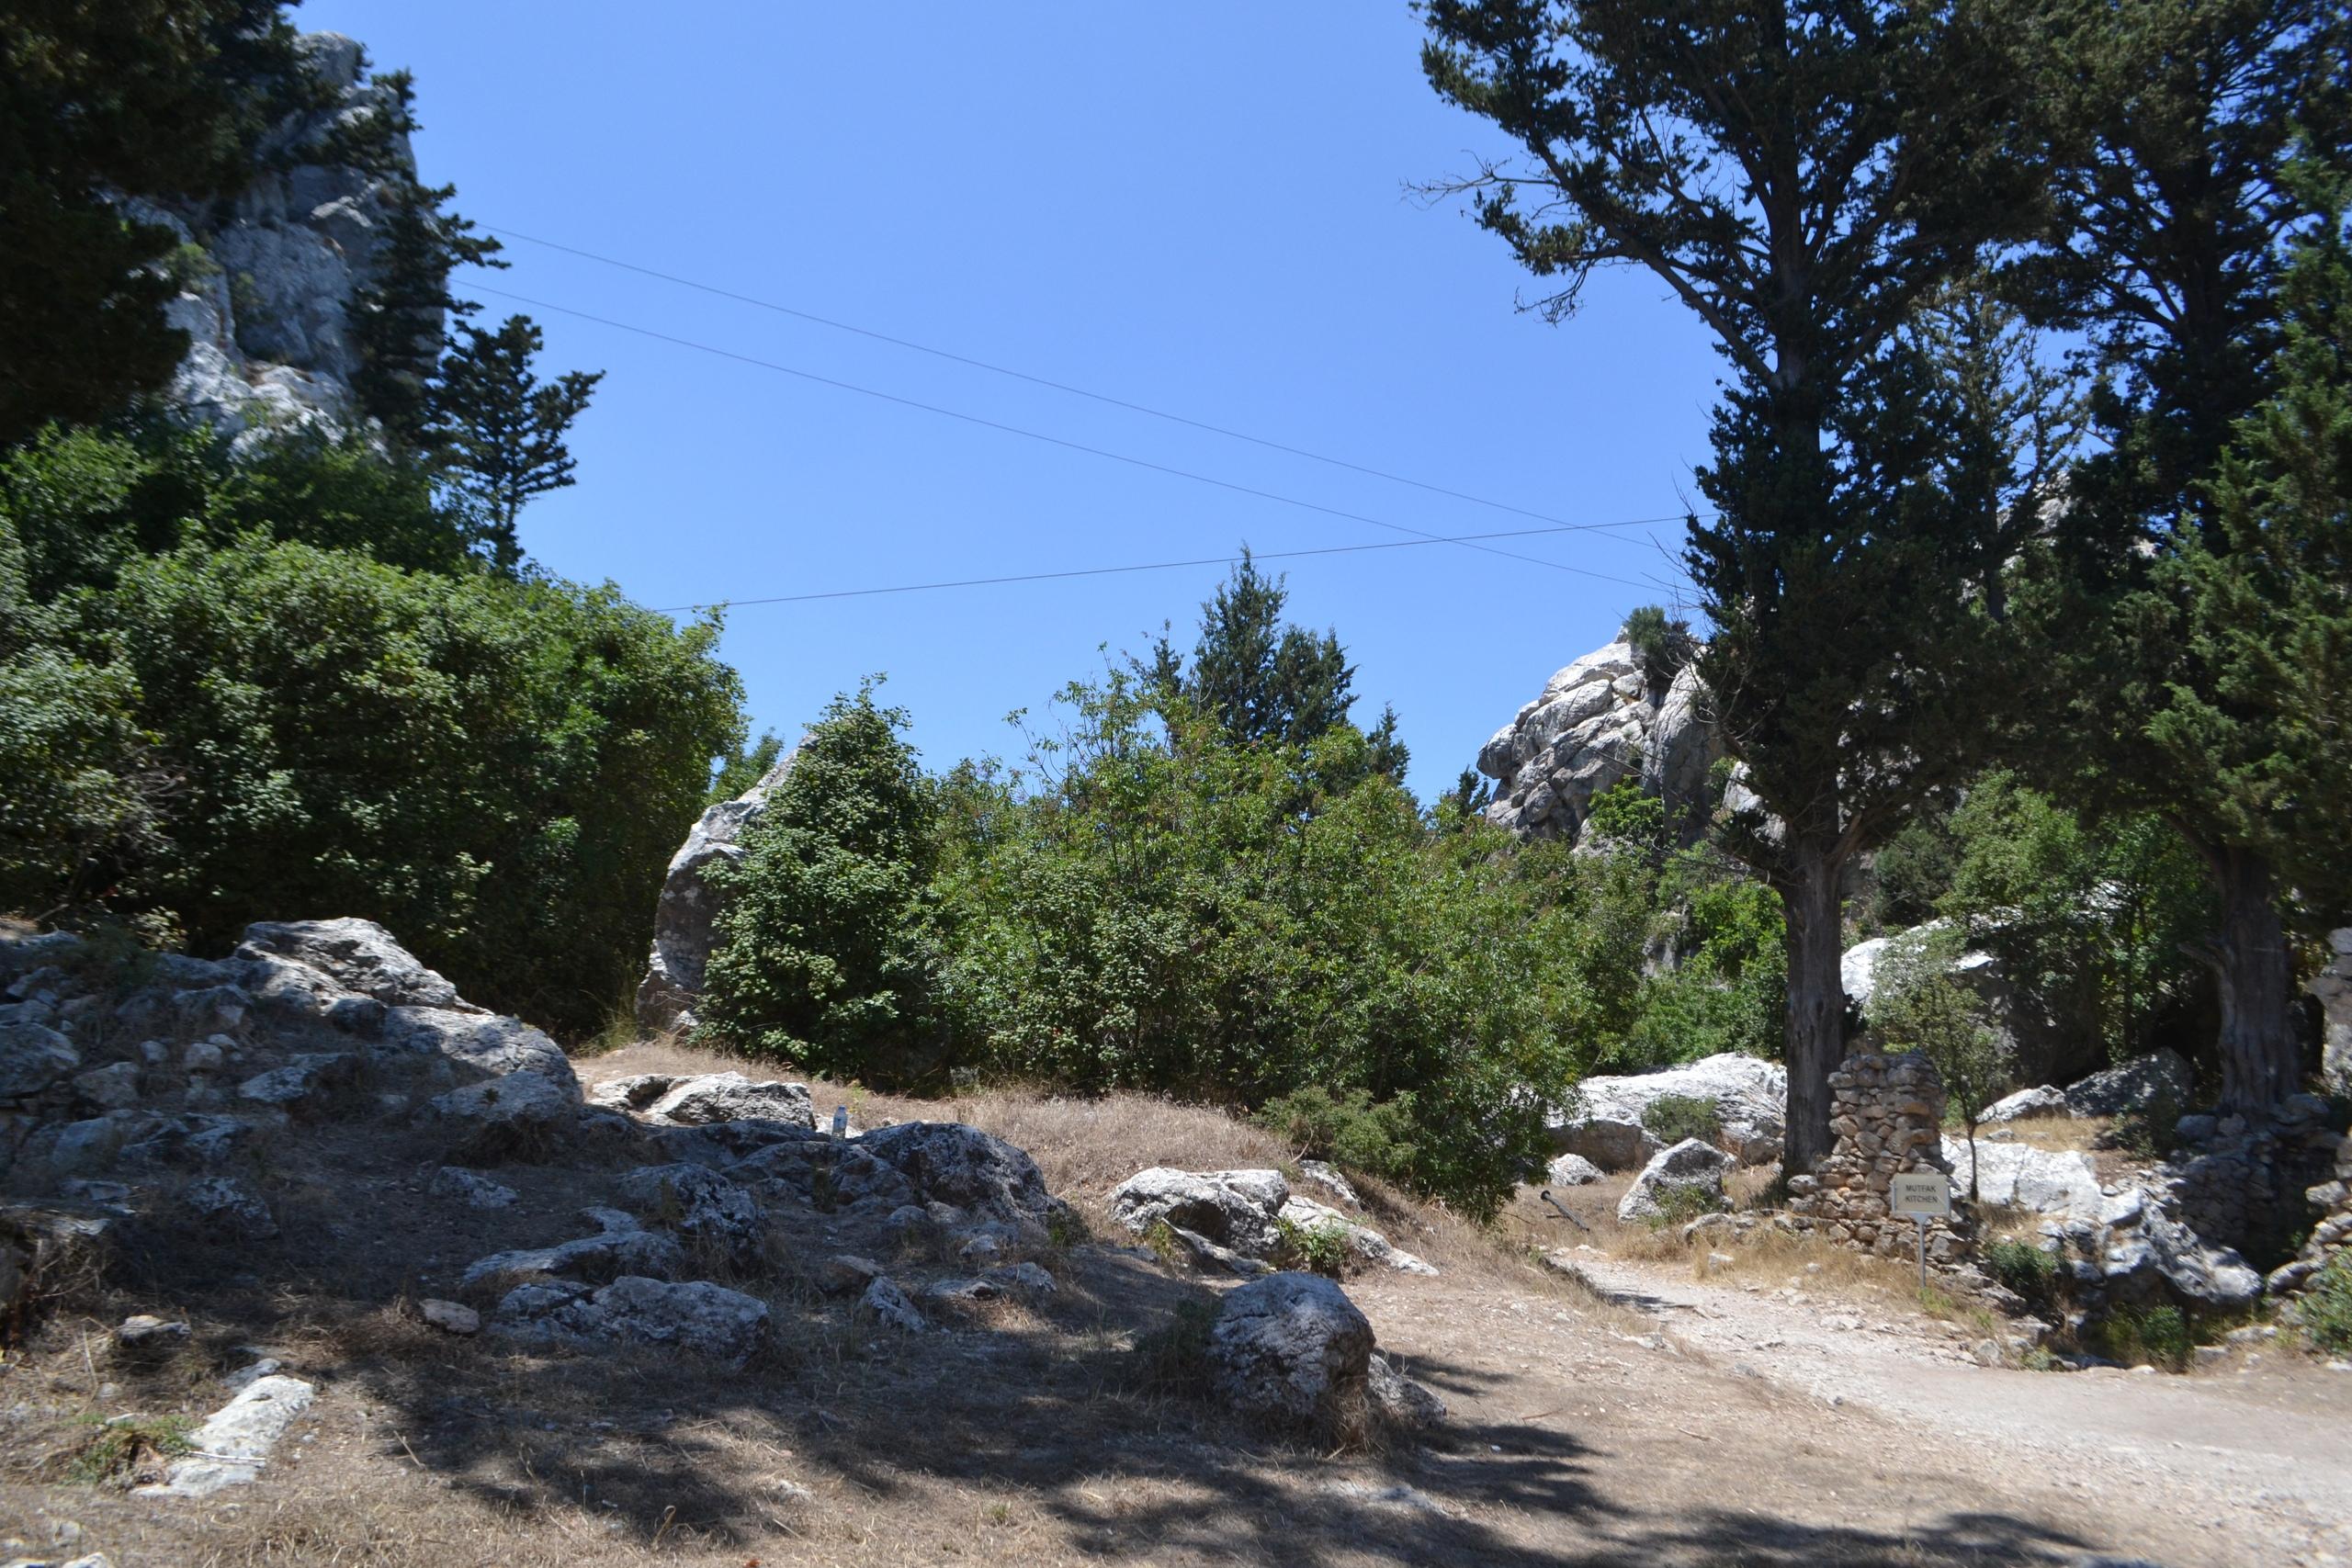 Северный Кипр. Замок Святого Иллариона. (фото). - Страница 3 LmoUq-O0N8Q